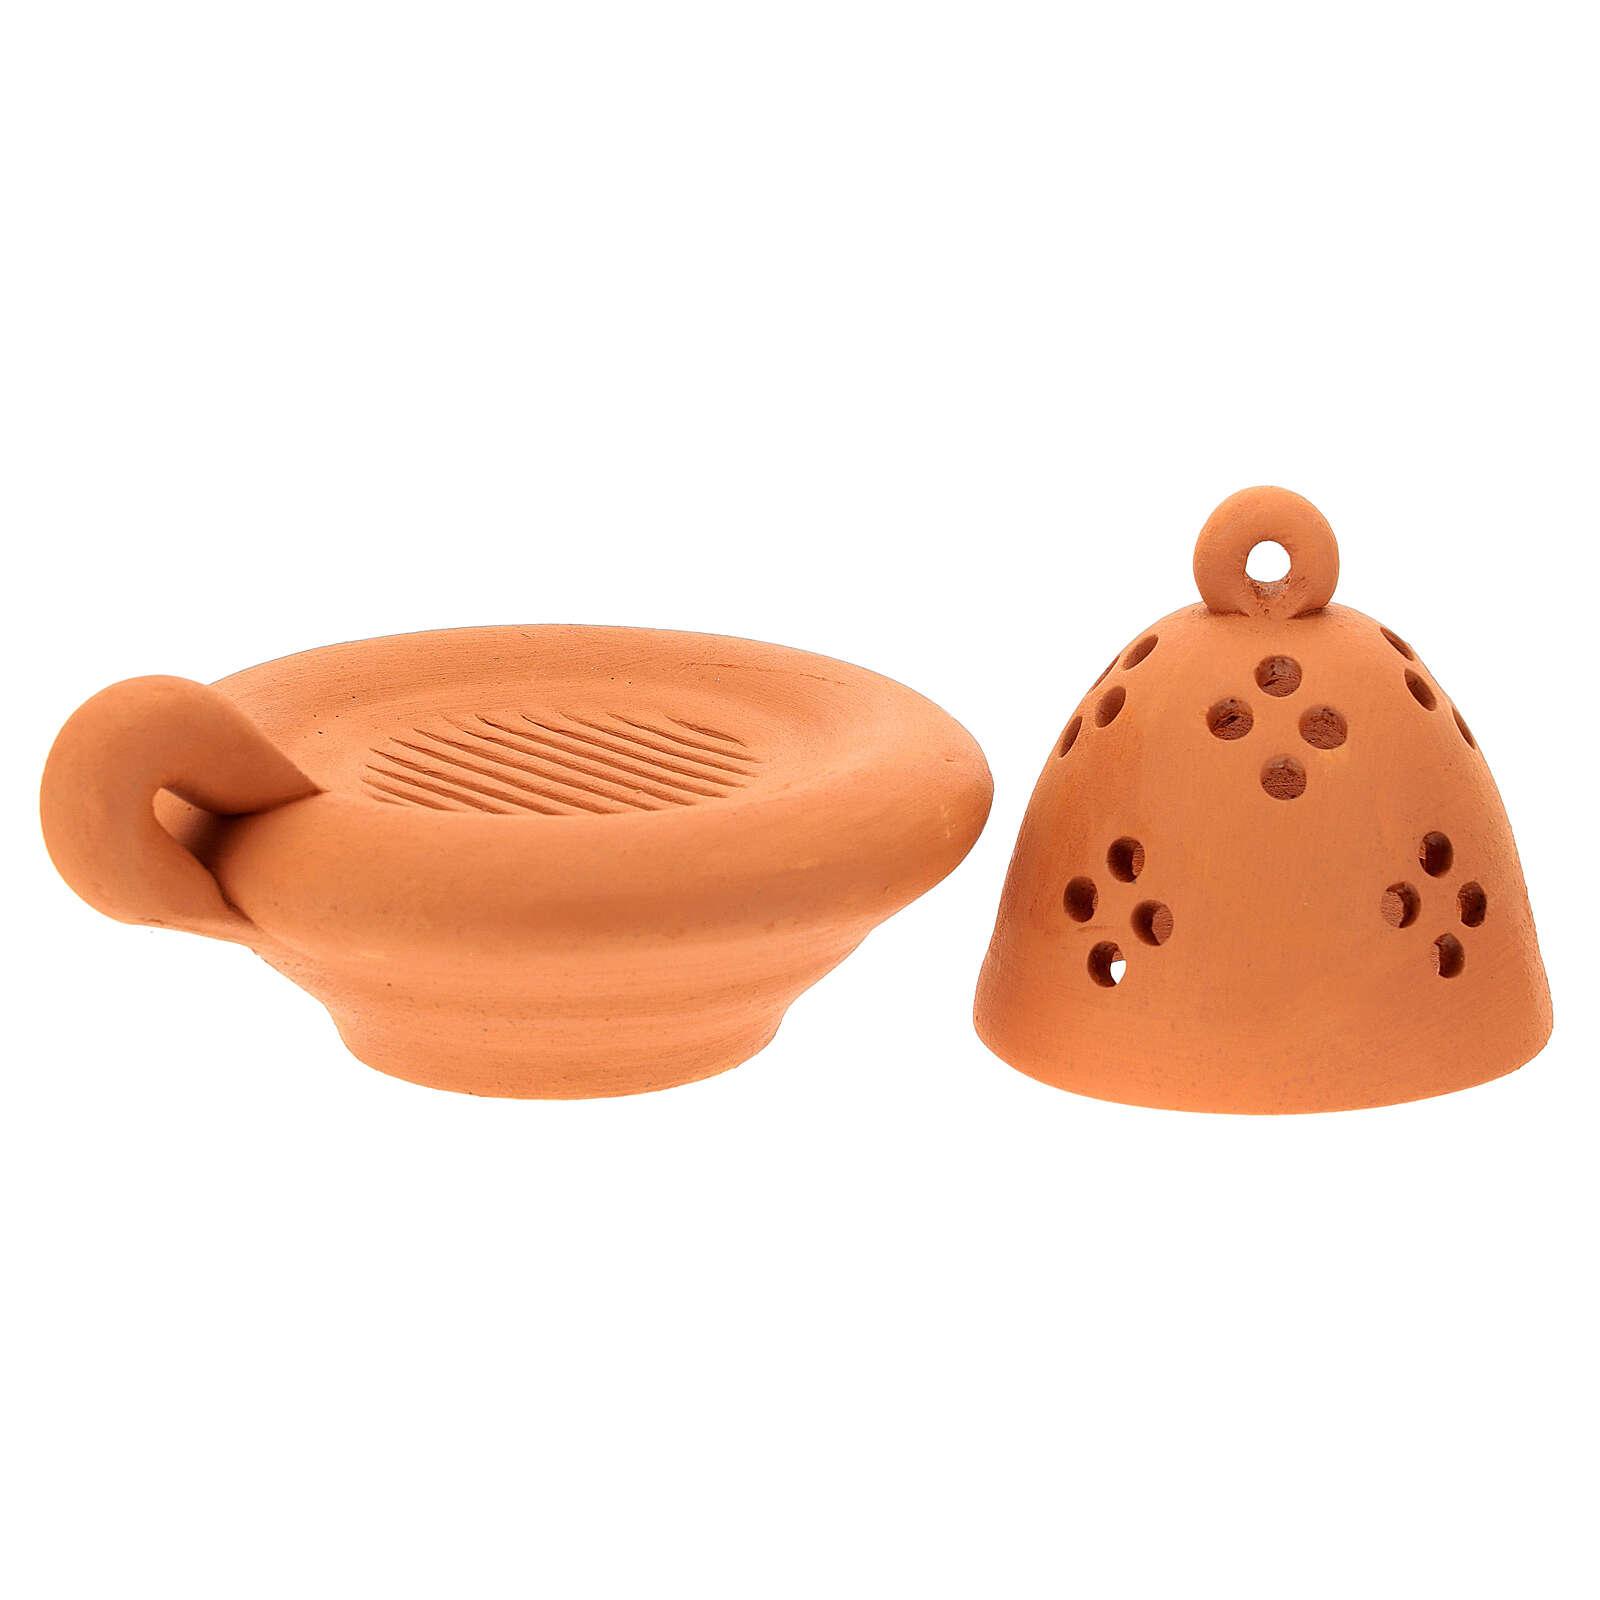 Bruciaincenso arancione in terracotta 3